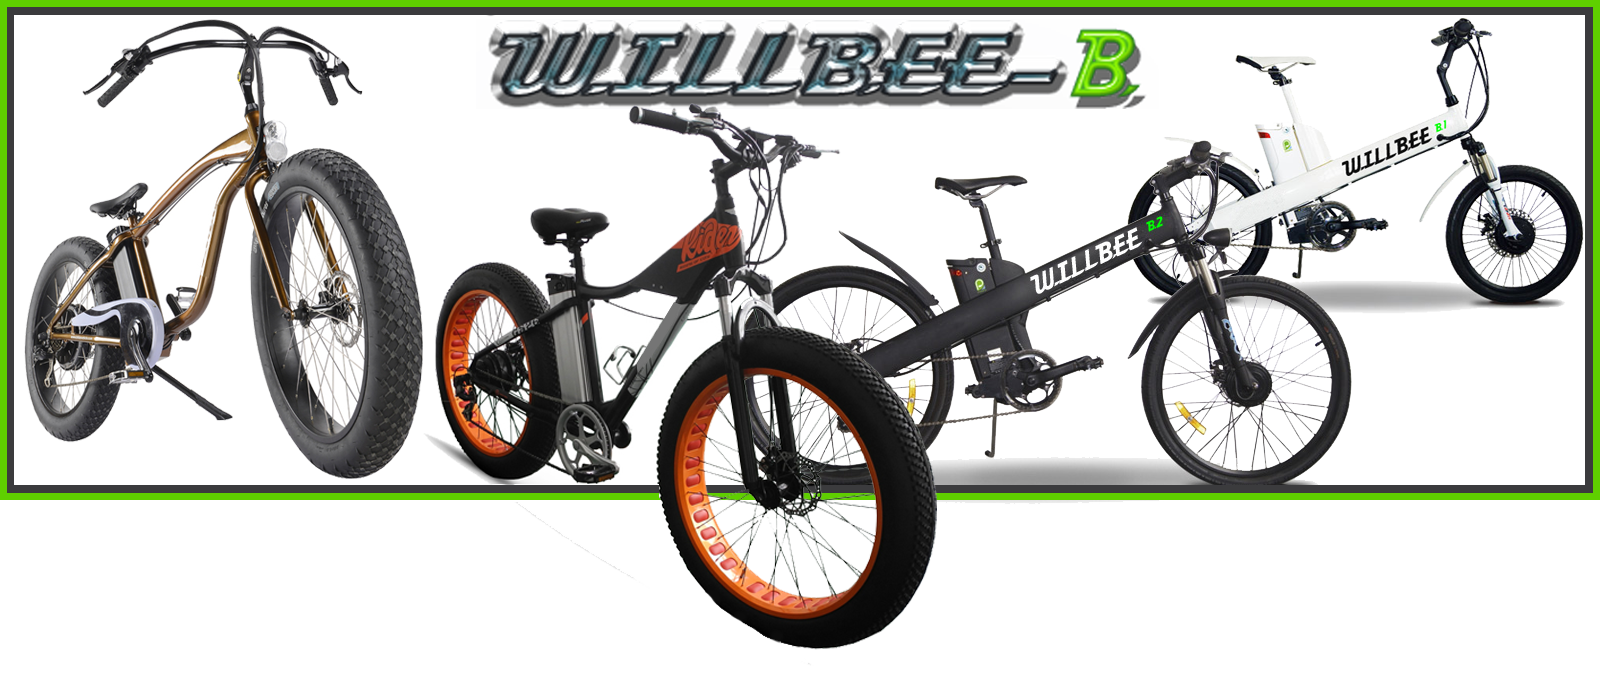 willbee b banniere